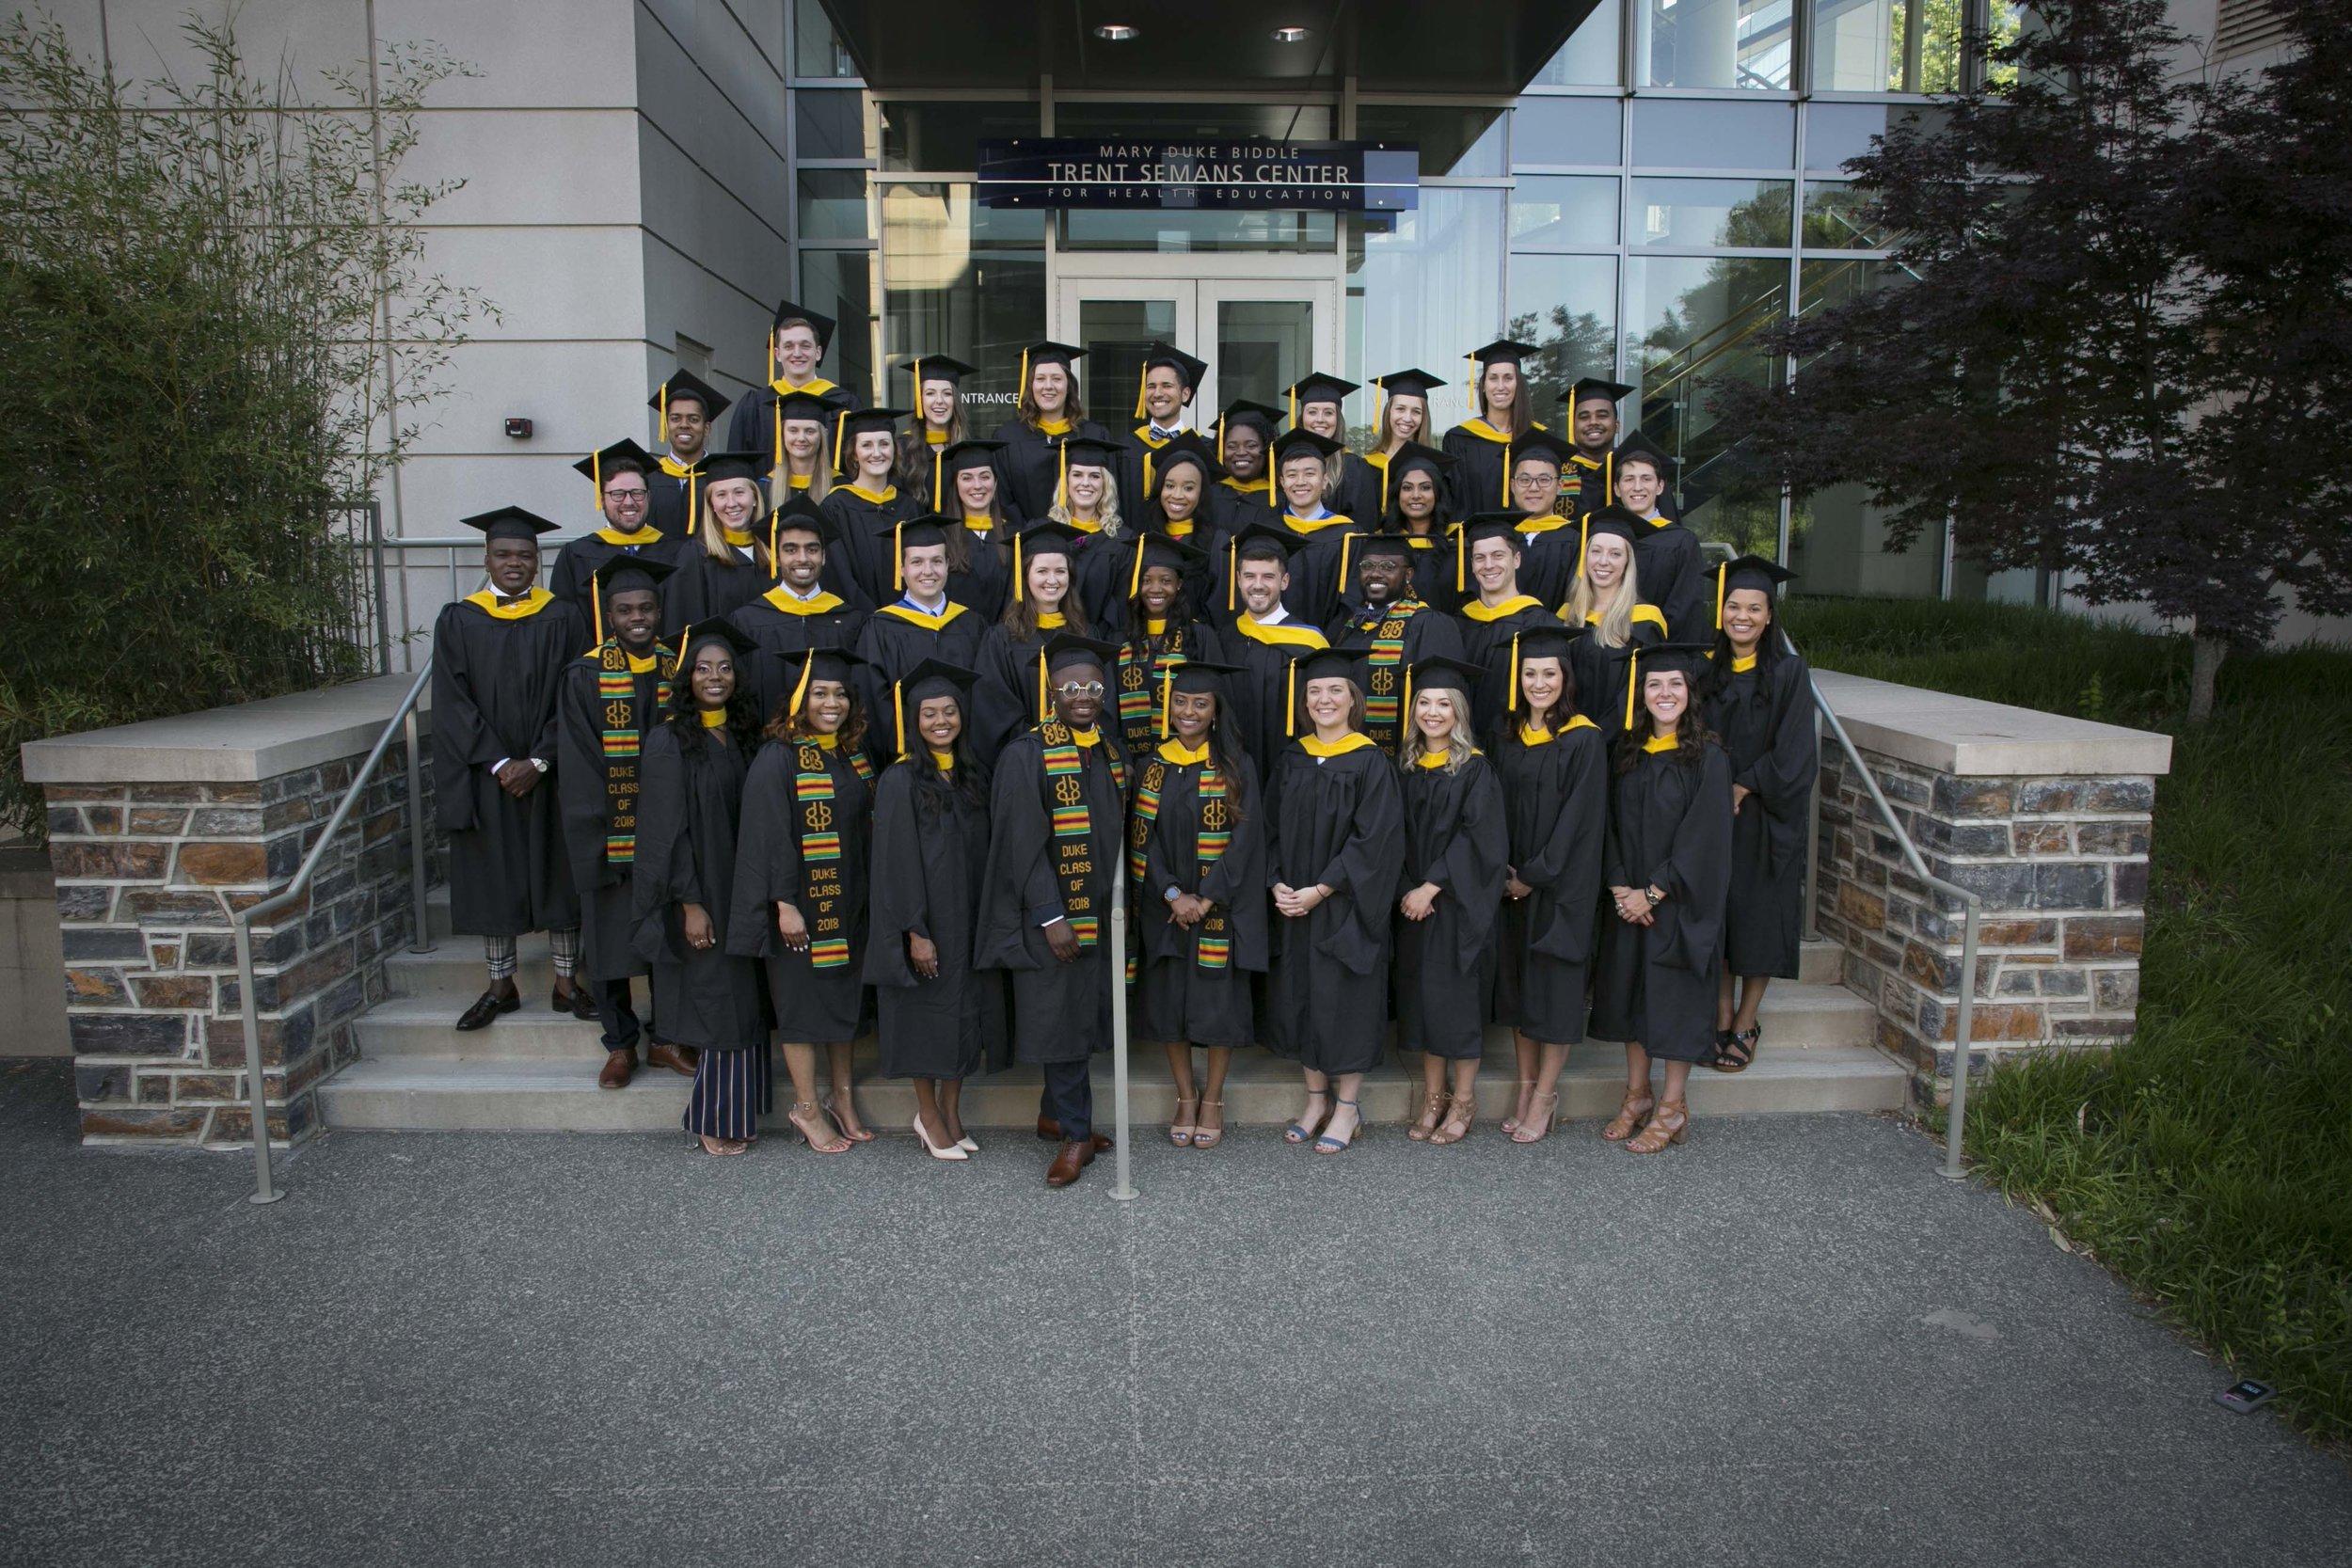 051218_mbs_graduation043.JPG